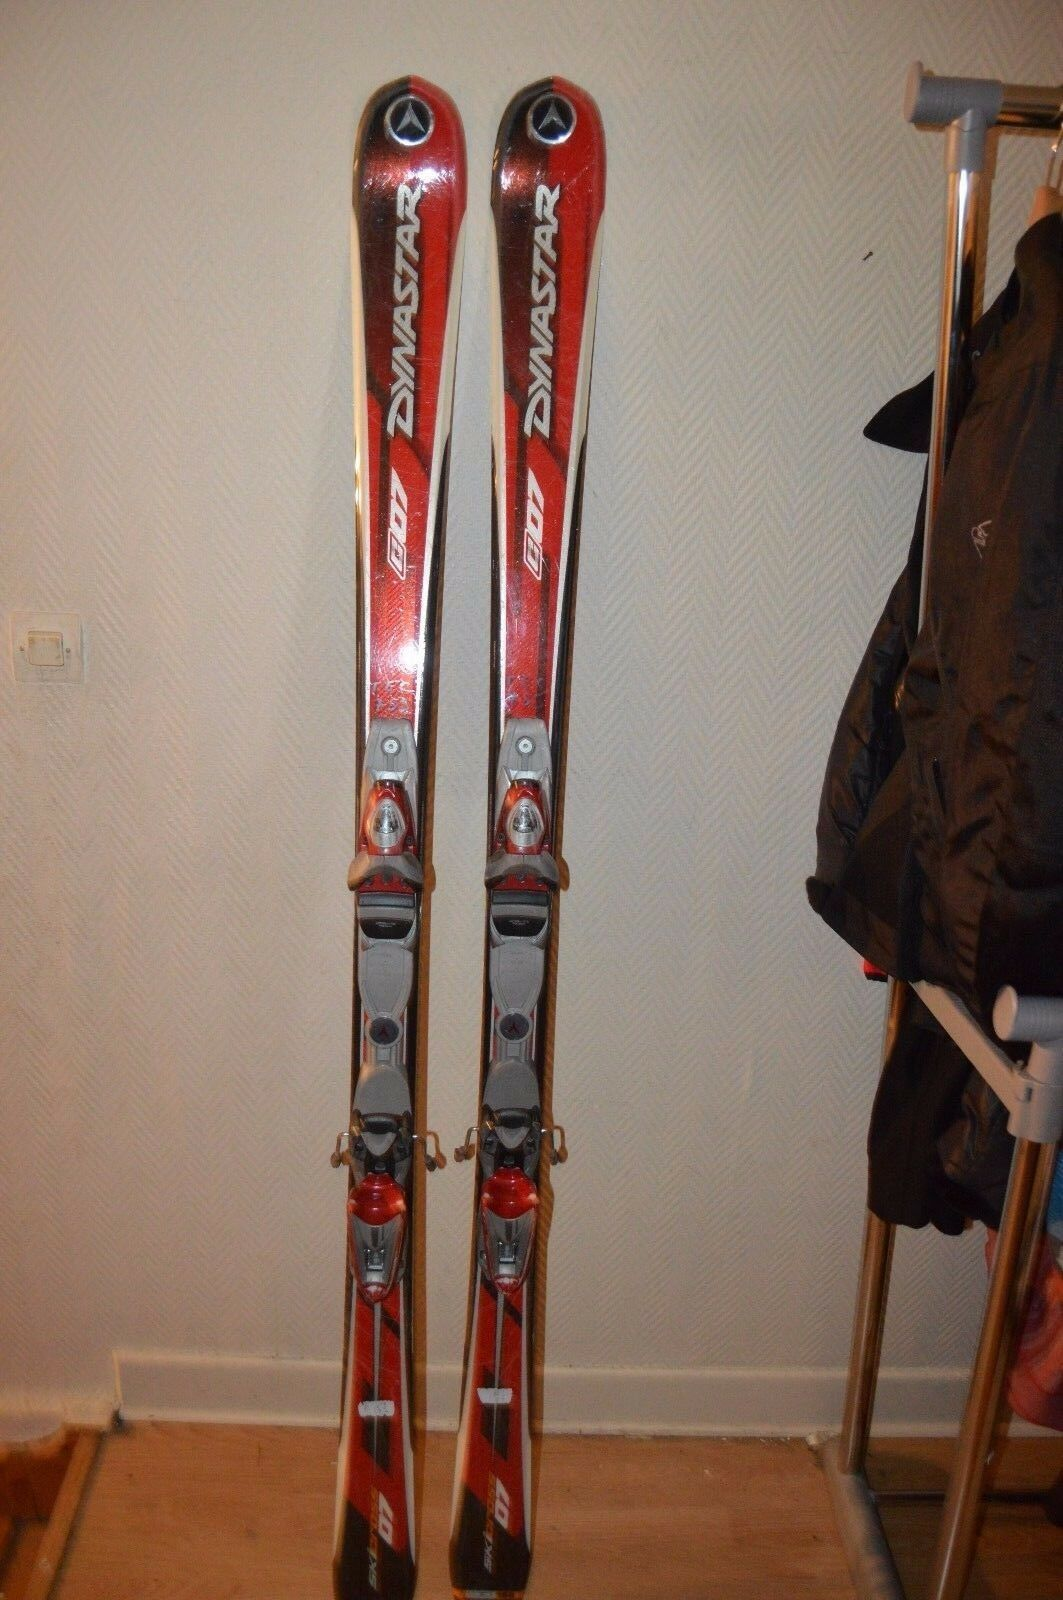 Ski Dynastar Ski cross C07 Size 65 3 8in + Bindings Look Ais 11 Sci   Esqui